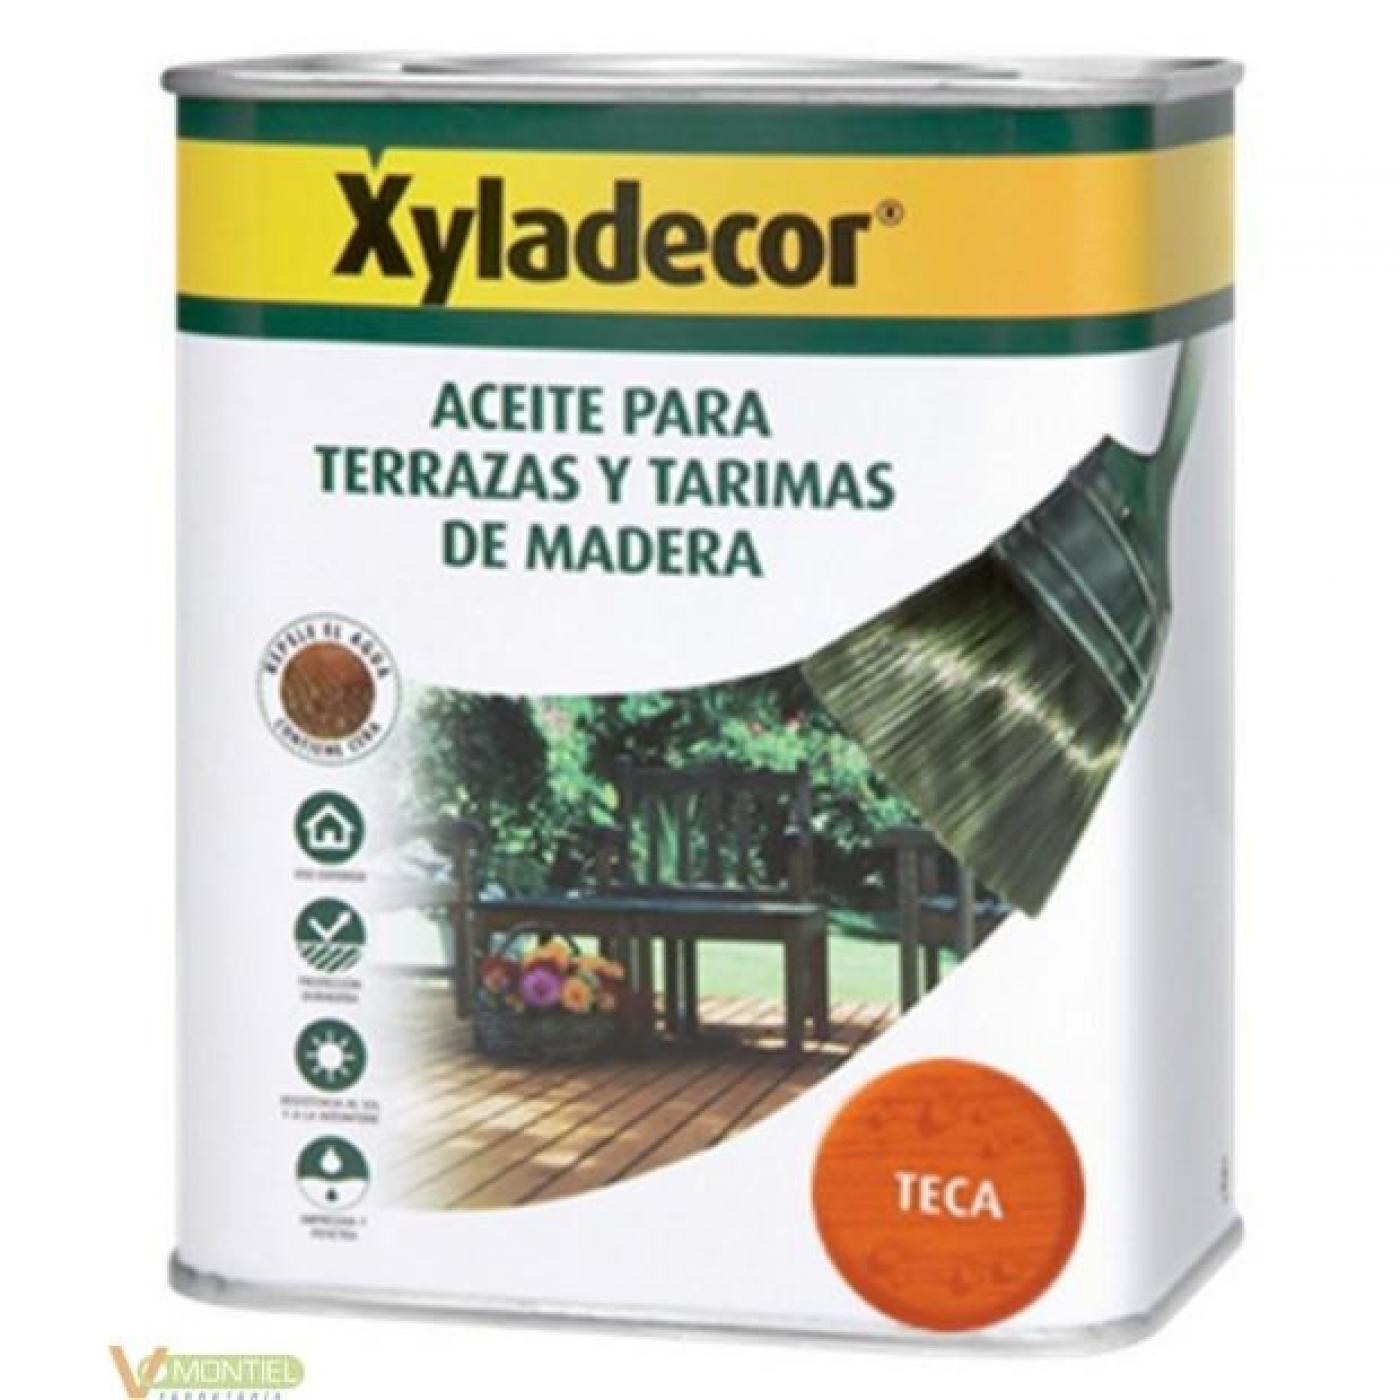 Aceite teca para terrazas y tarimas de madera xyladecor - Aceite de teca para madera ...